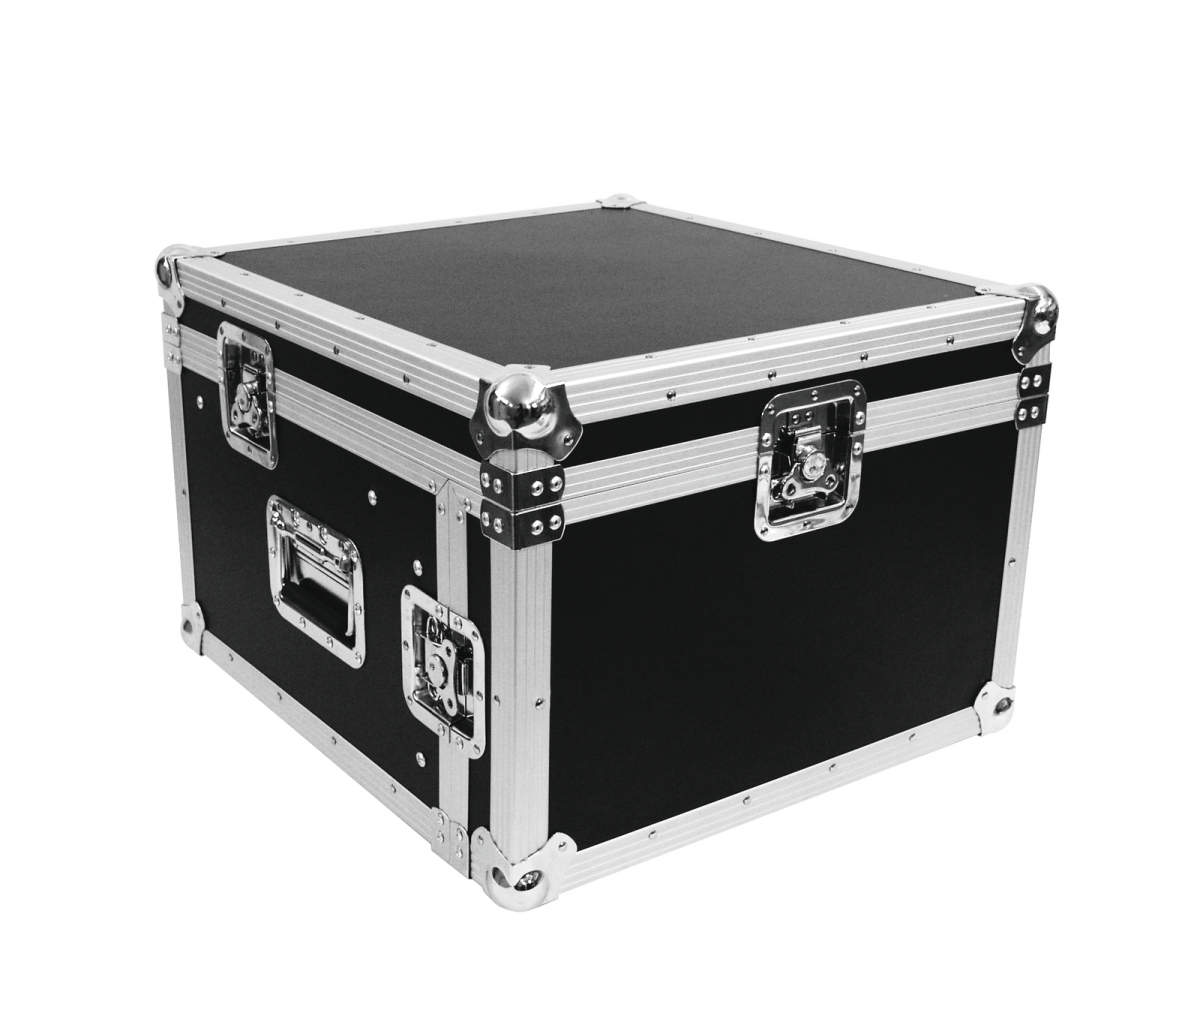 ROADINGERSpecial-Combo-Case Pro, 4U